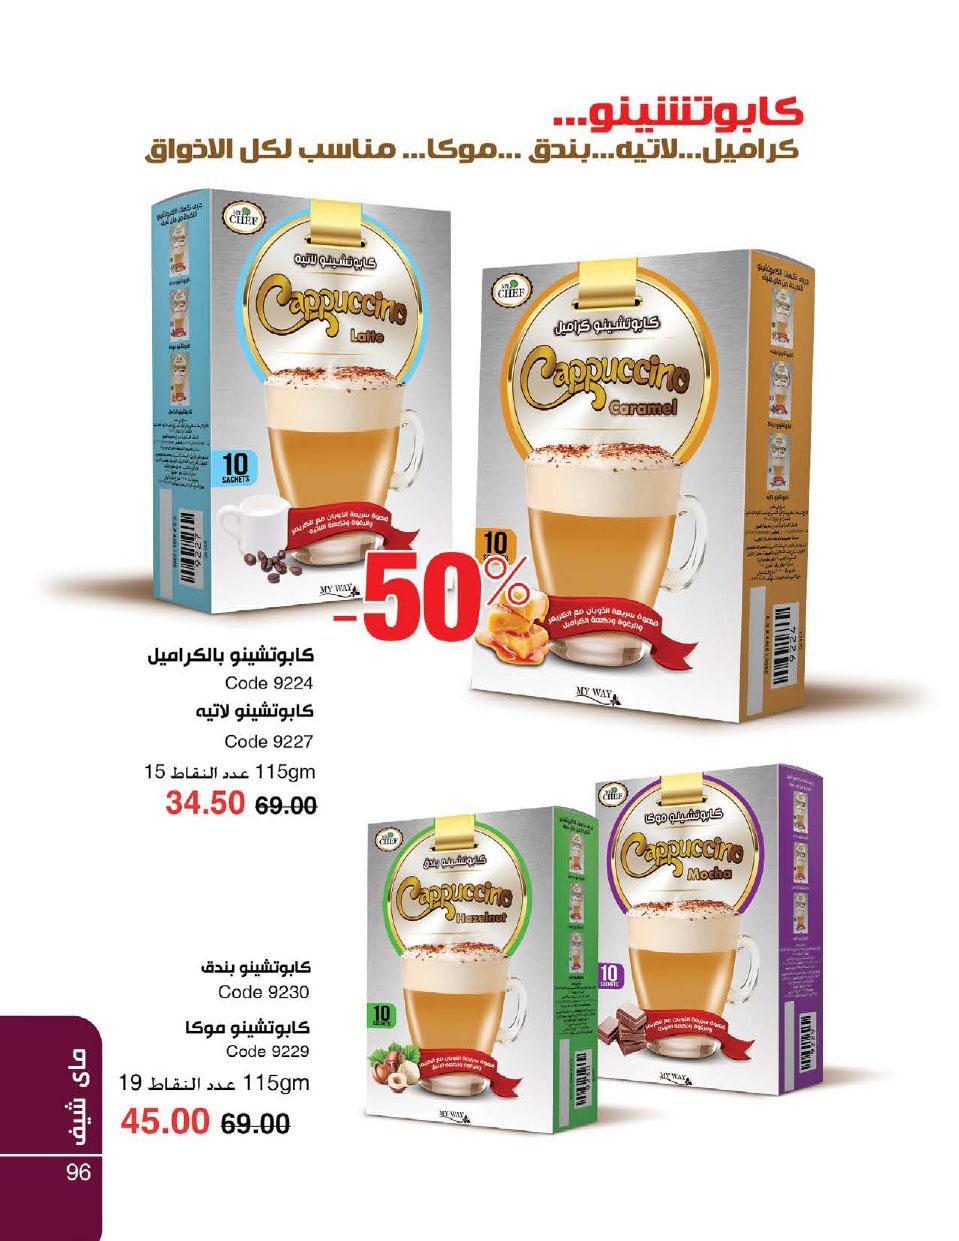 كتالوج سبتمبر 2020 من ماى واى مصر - صور كتالوج ماى واى الجديد لشهر 9 / 2020 09-sep58